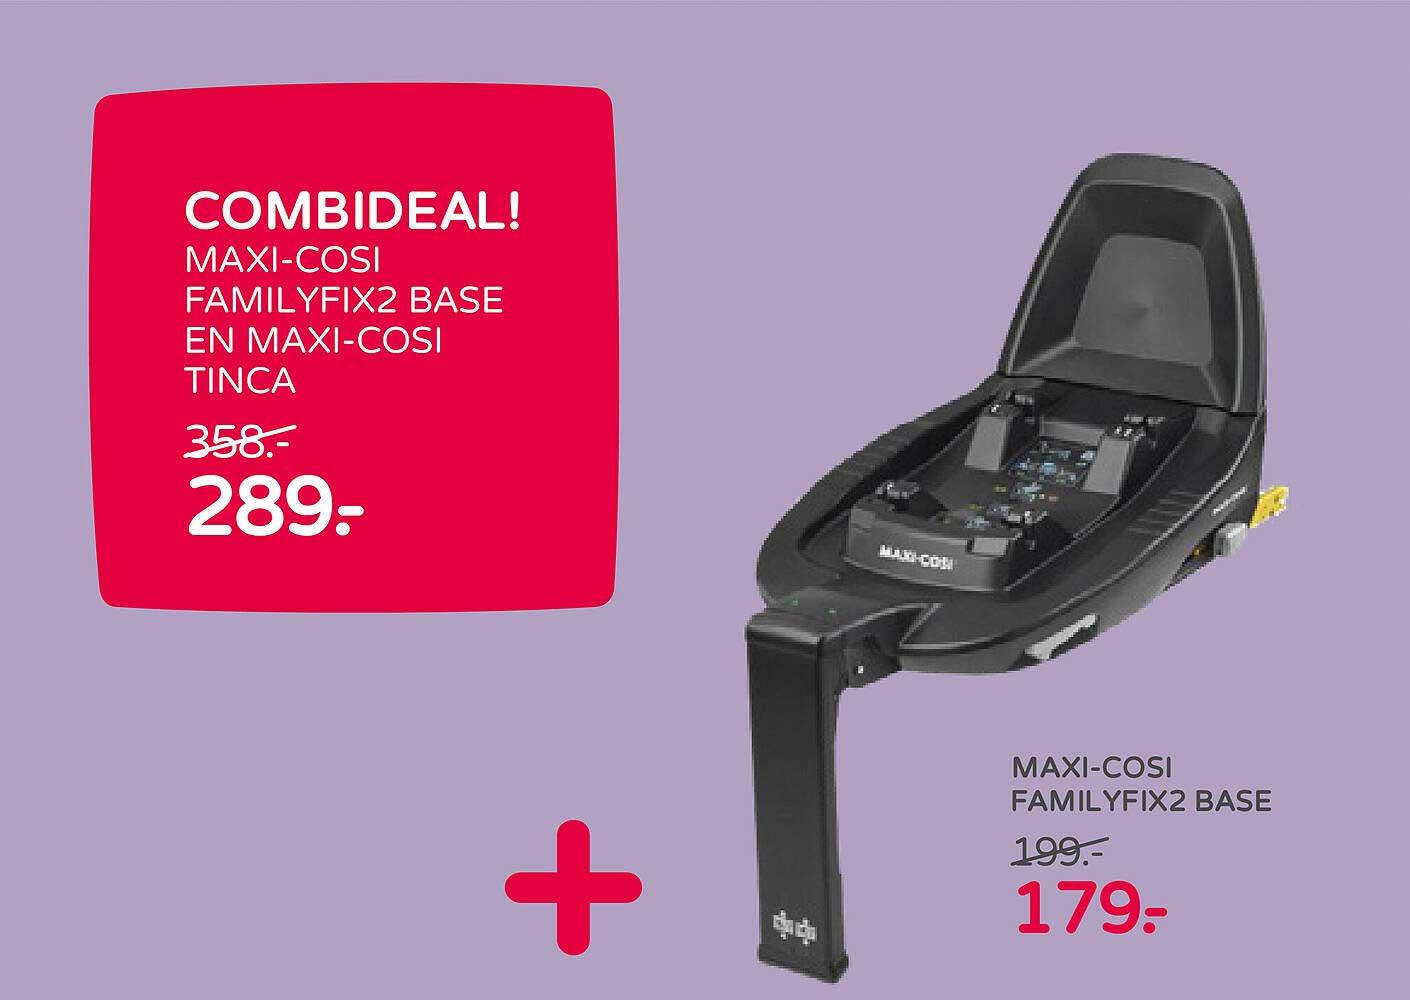 Prénatal Combideal! Maxi-Cosi Familyfix2 Base En Maxi-Cosi Tinca Of Maxi-Cosi Familyfix2 Base